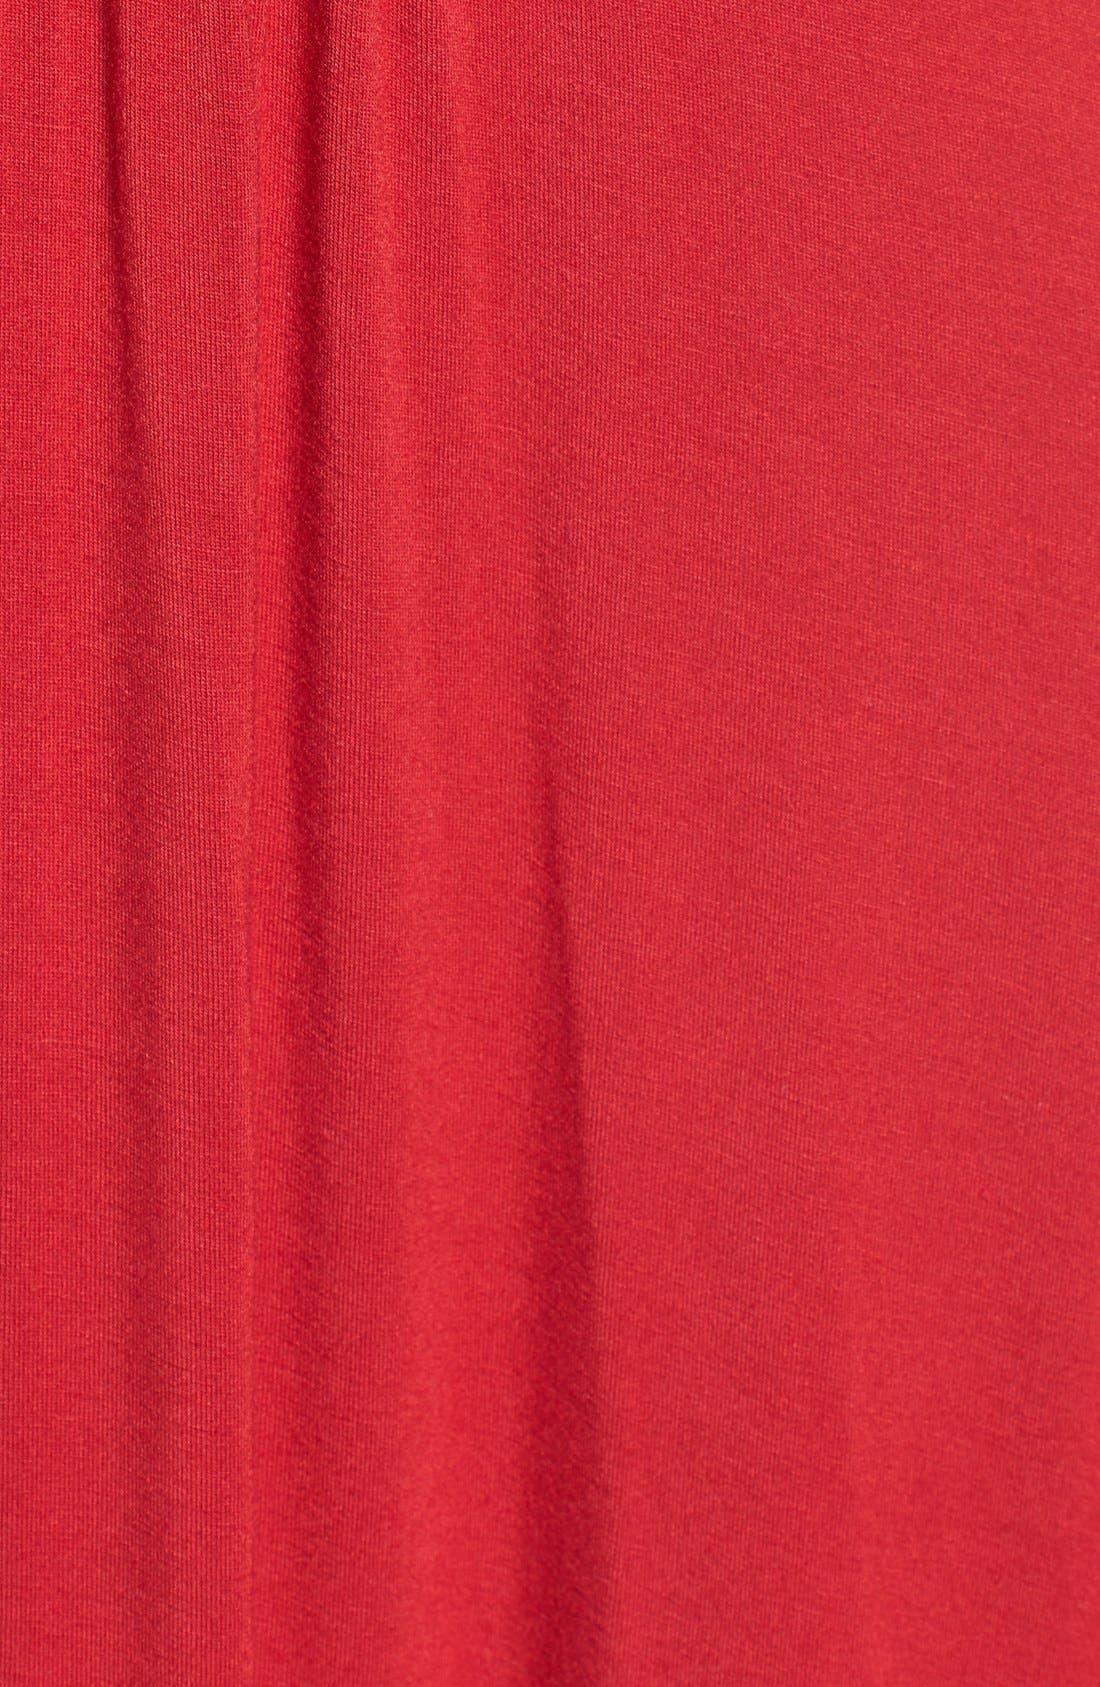 Alternate Image 5  - Caslon® Knit Maxi Dress (Regular & Petite)